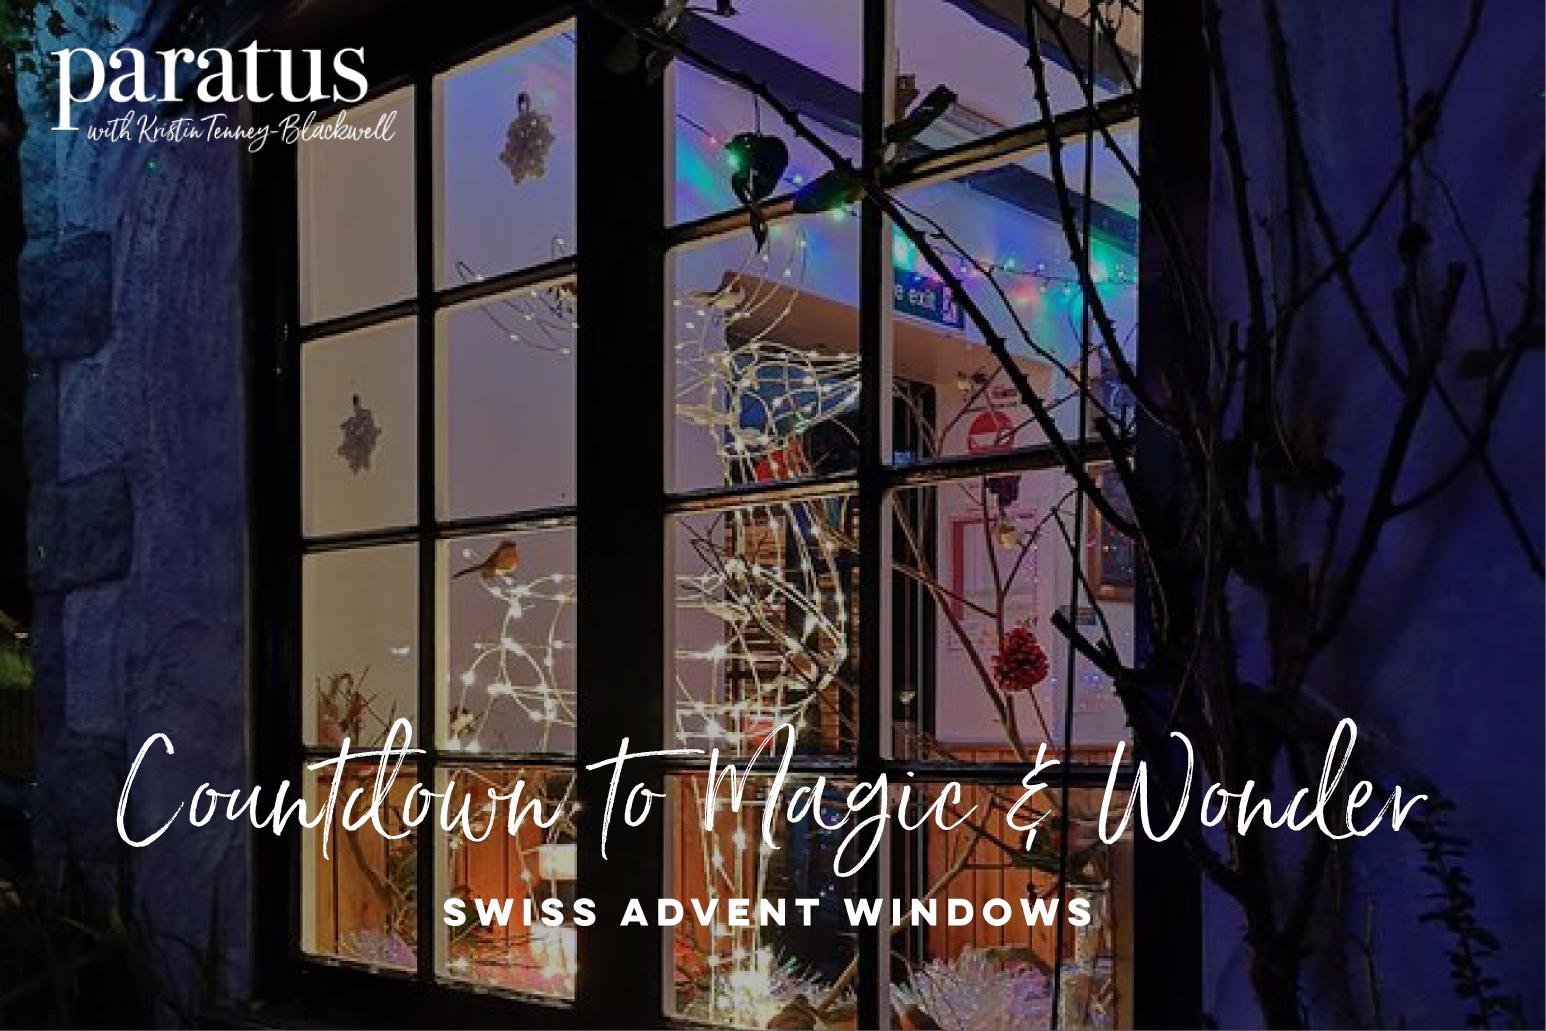 Paratus - Countdown to magic and wonder-